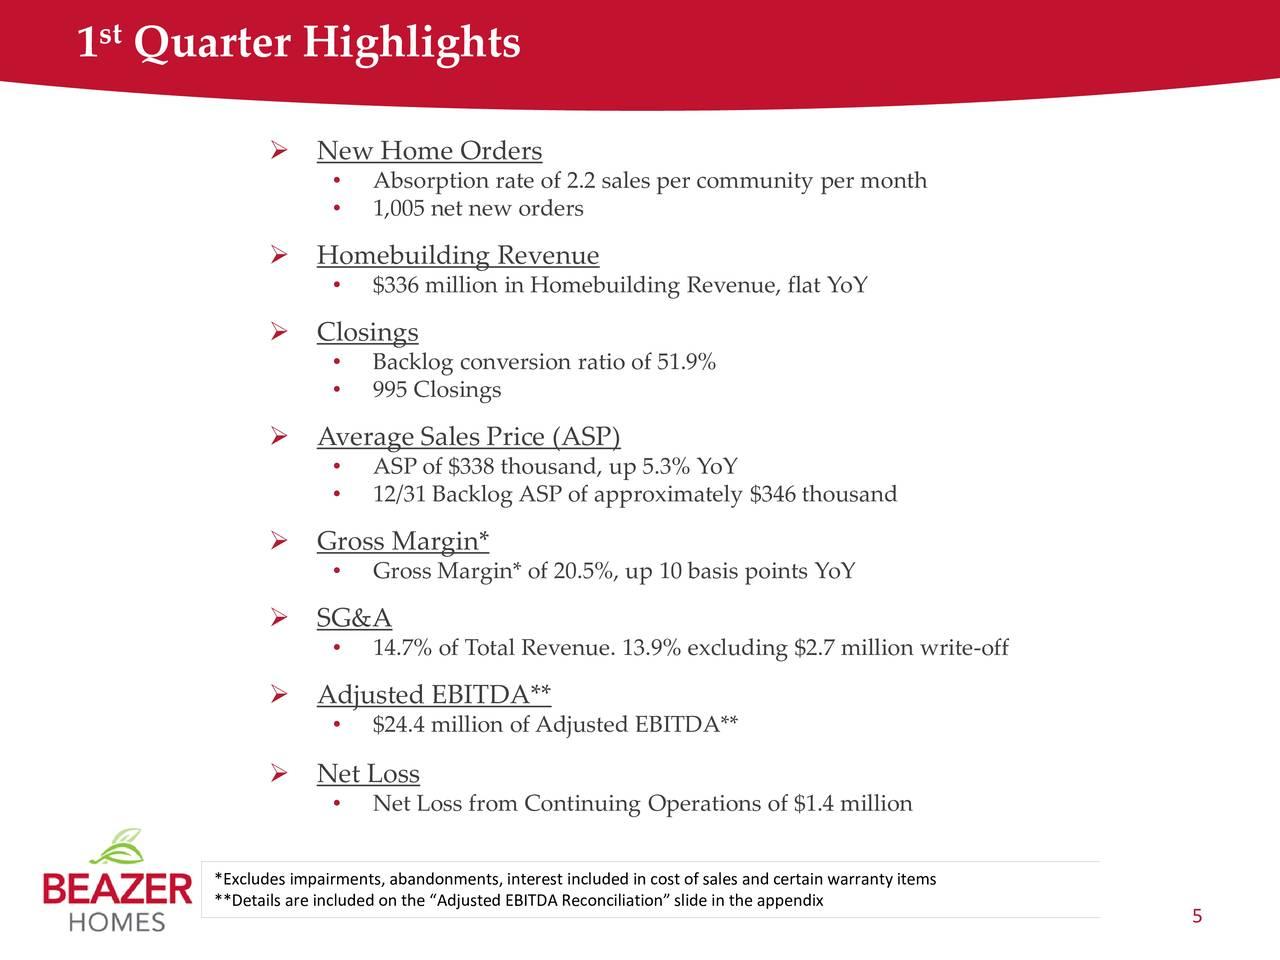 beazer homes case q 5 7 Beazer homes usa 2005 rank: 473 75 na ó stockholders' equity 191 na.